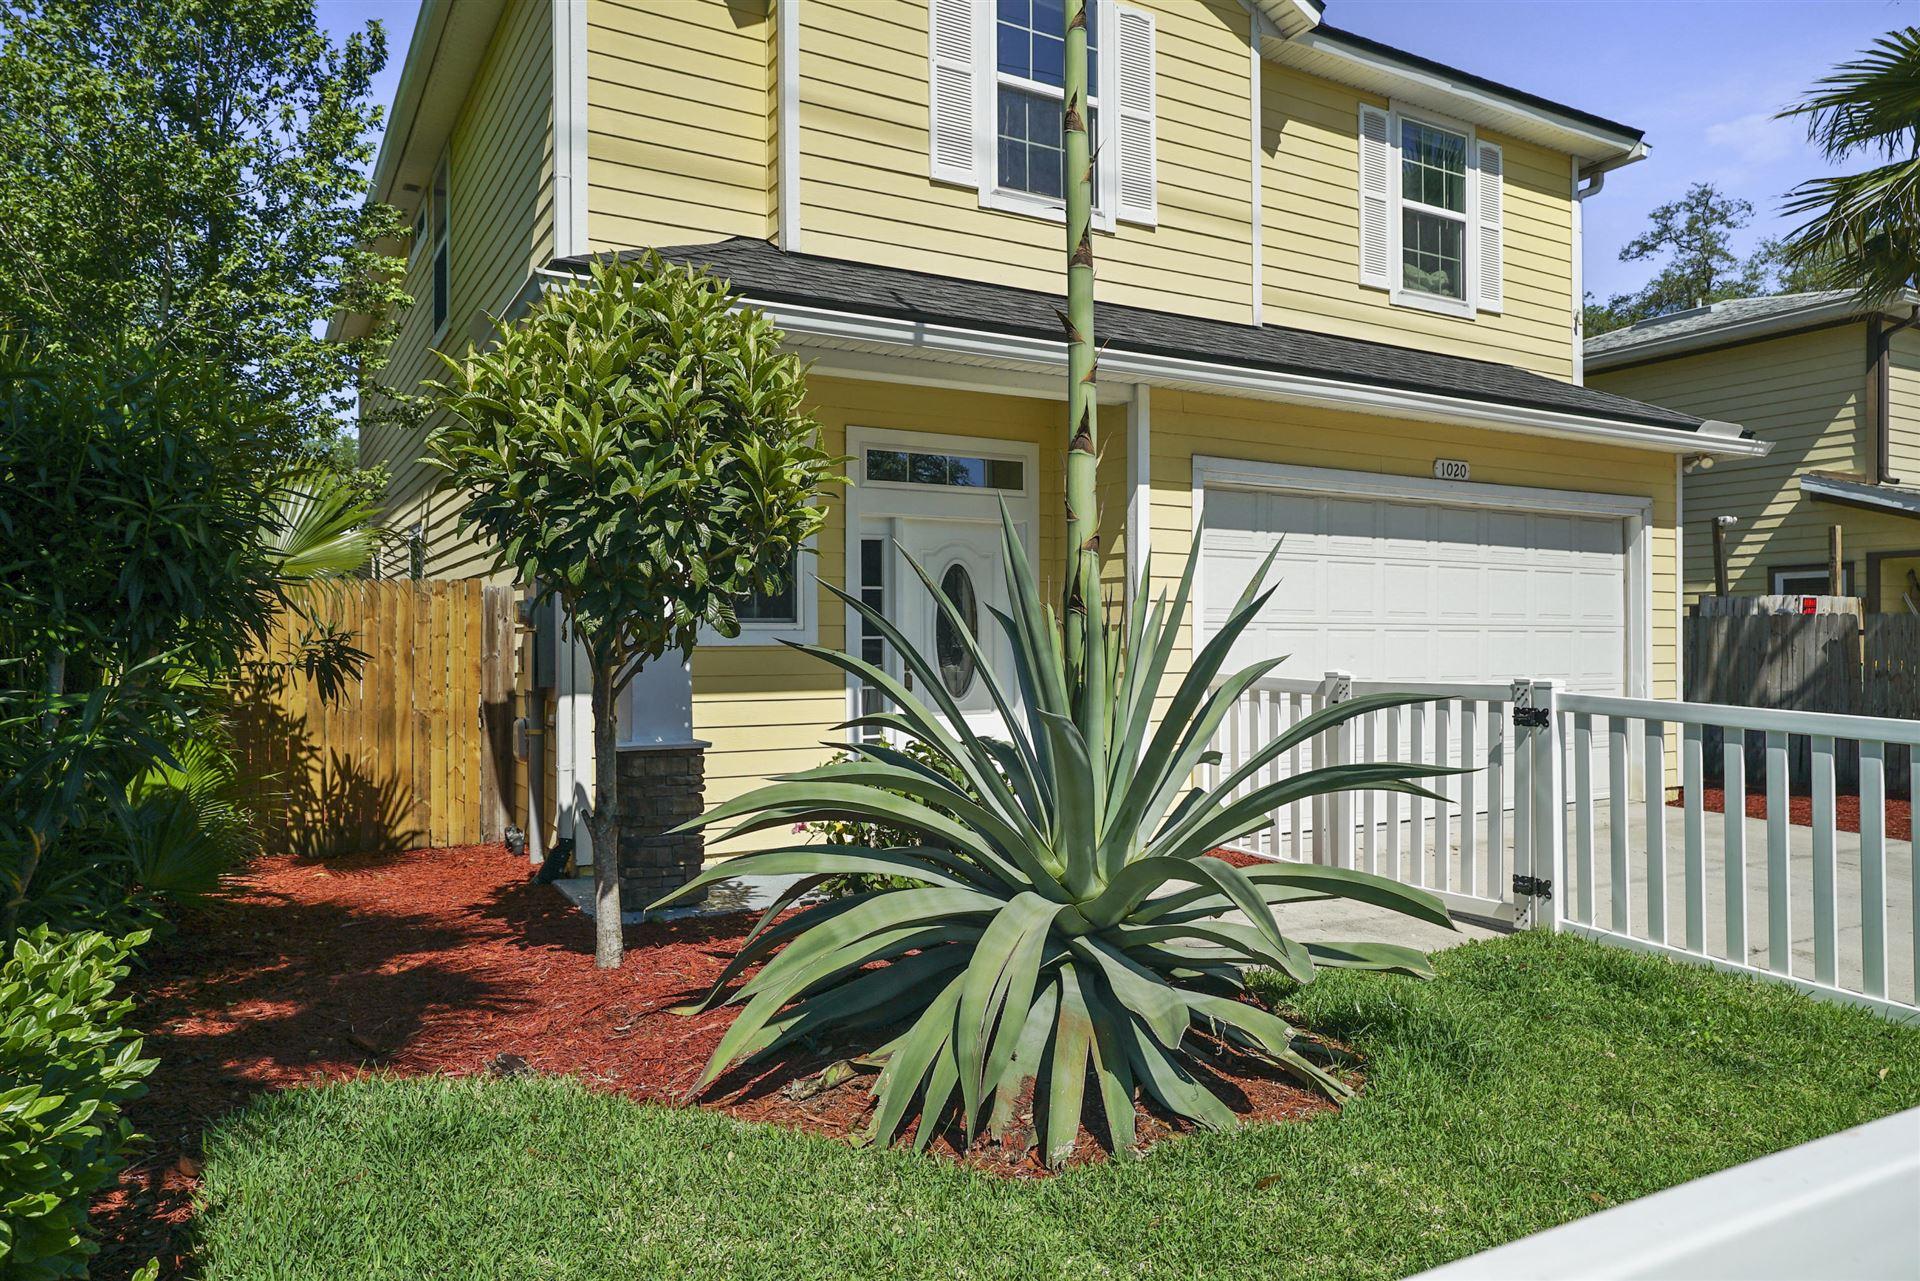 1020 PENMAN RD, Jacksonville Beach, FL 32250 - MLS#: 1109126